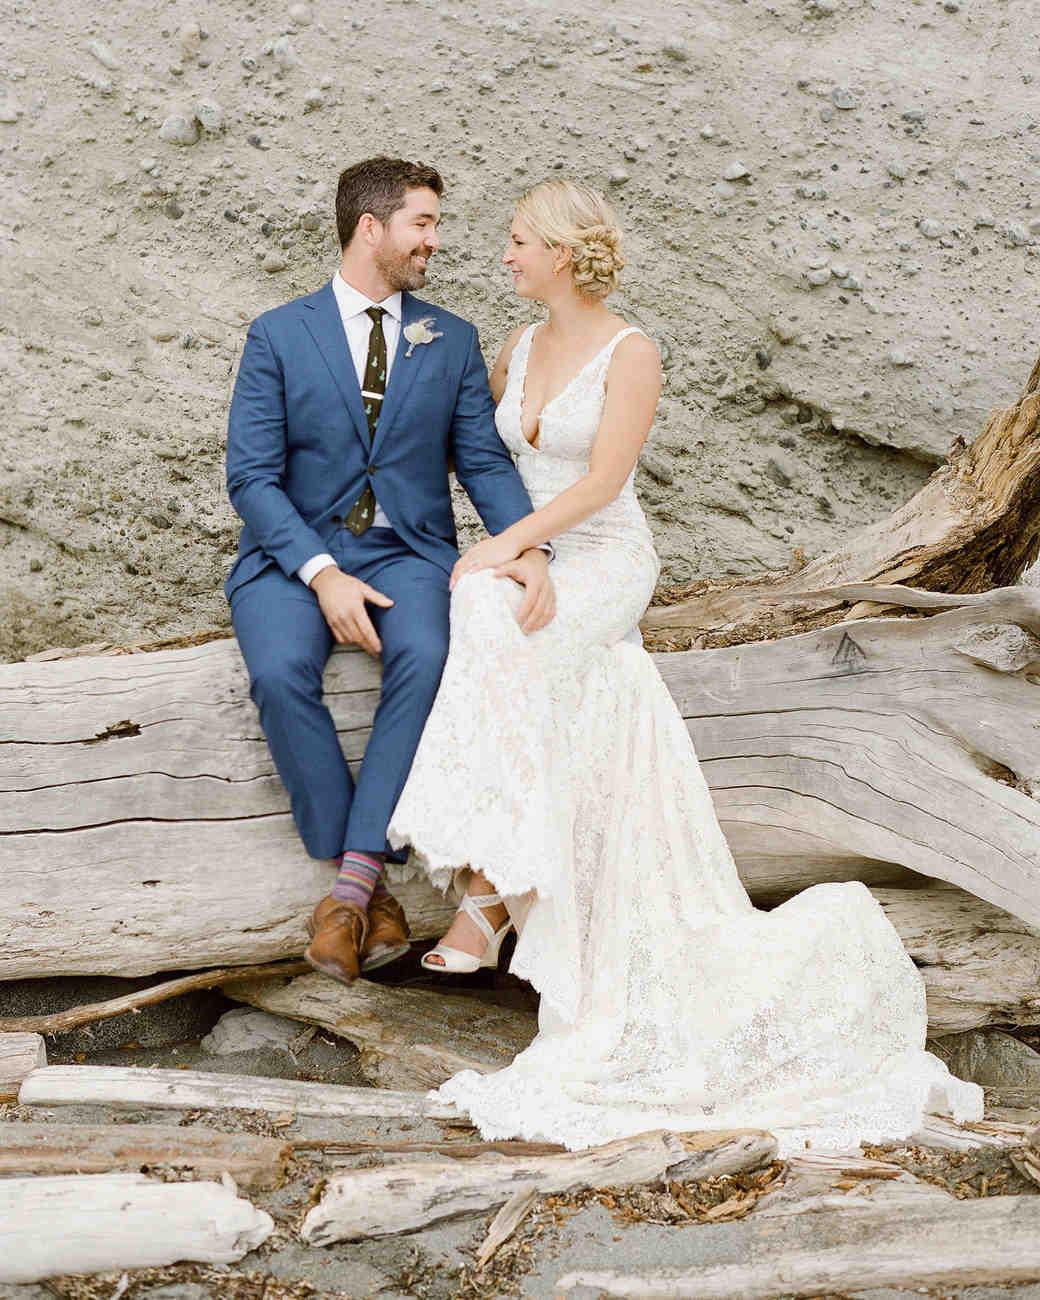 kaitlin dan wedding couple